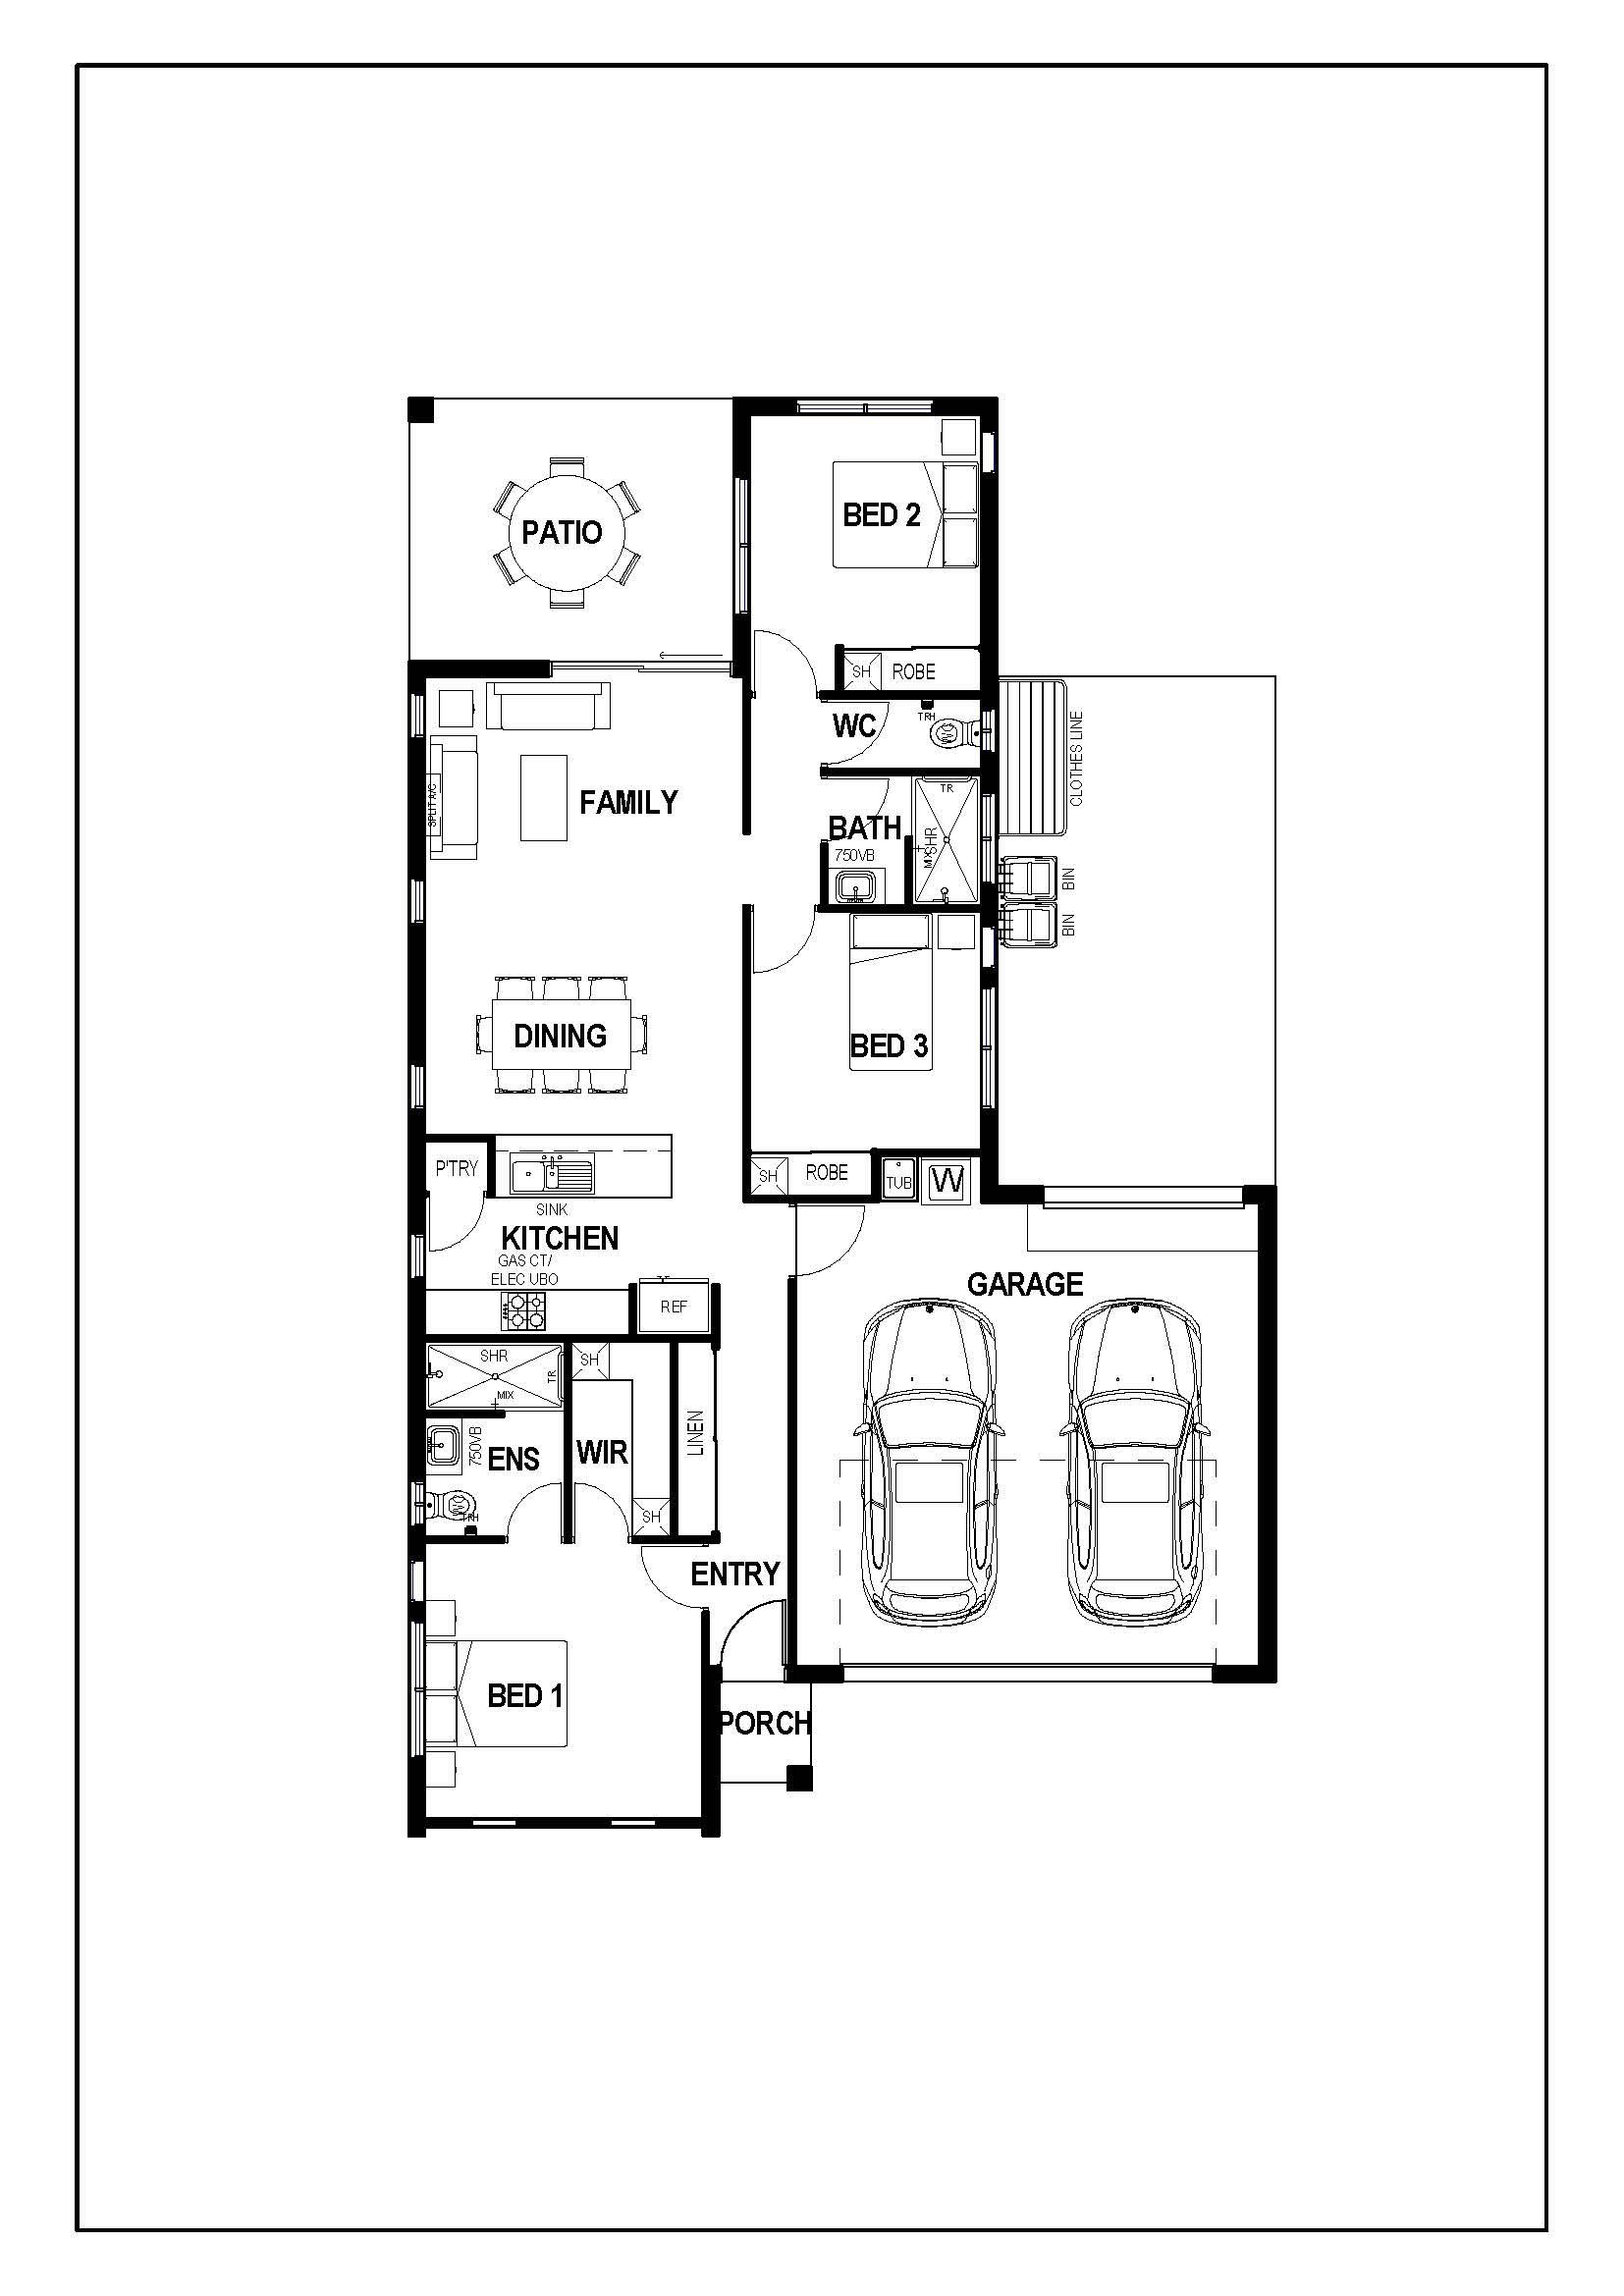 Inspire 146B Dble Garage Floor plan.jpg